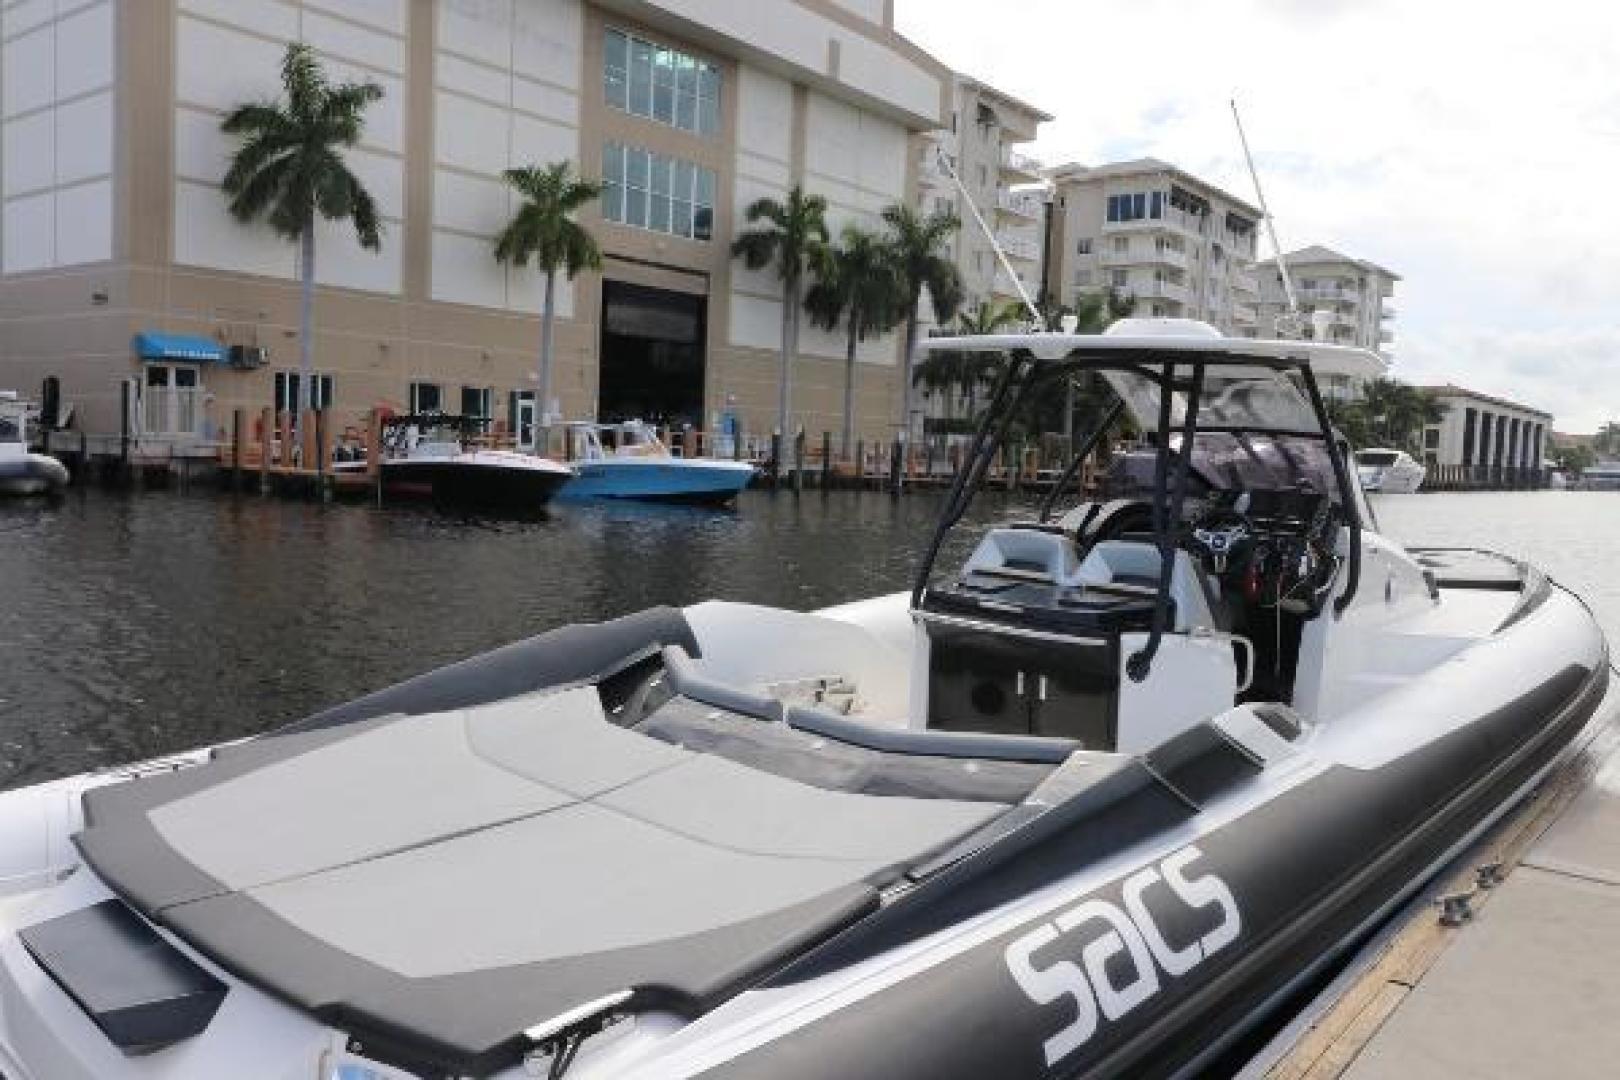 Sacs-Strider 40 ESSE R 2016-Sacs Strider 40 ESSE R Fort Lauderdale-Florida-United States-1533426   Thumbnail